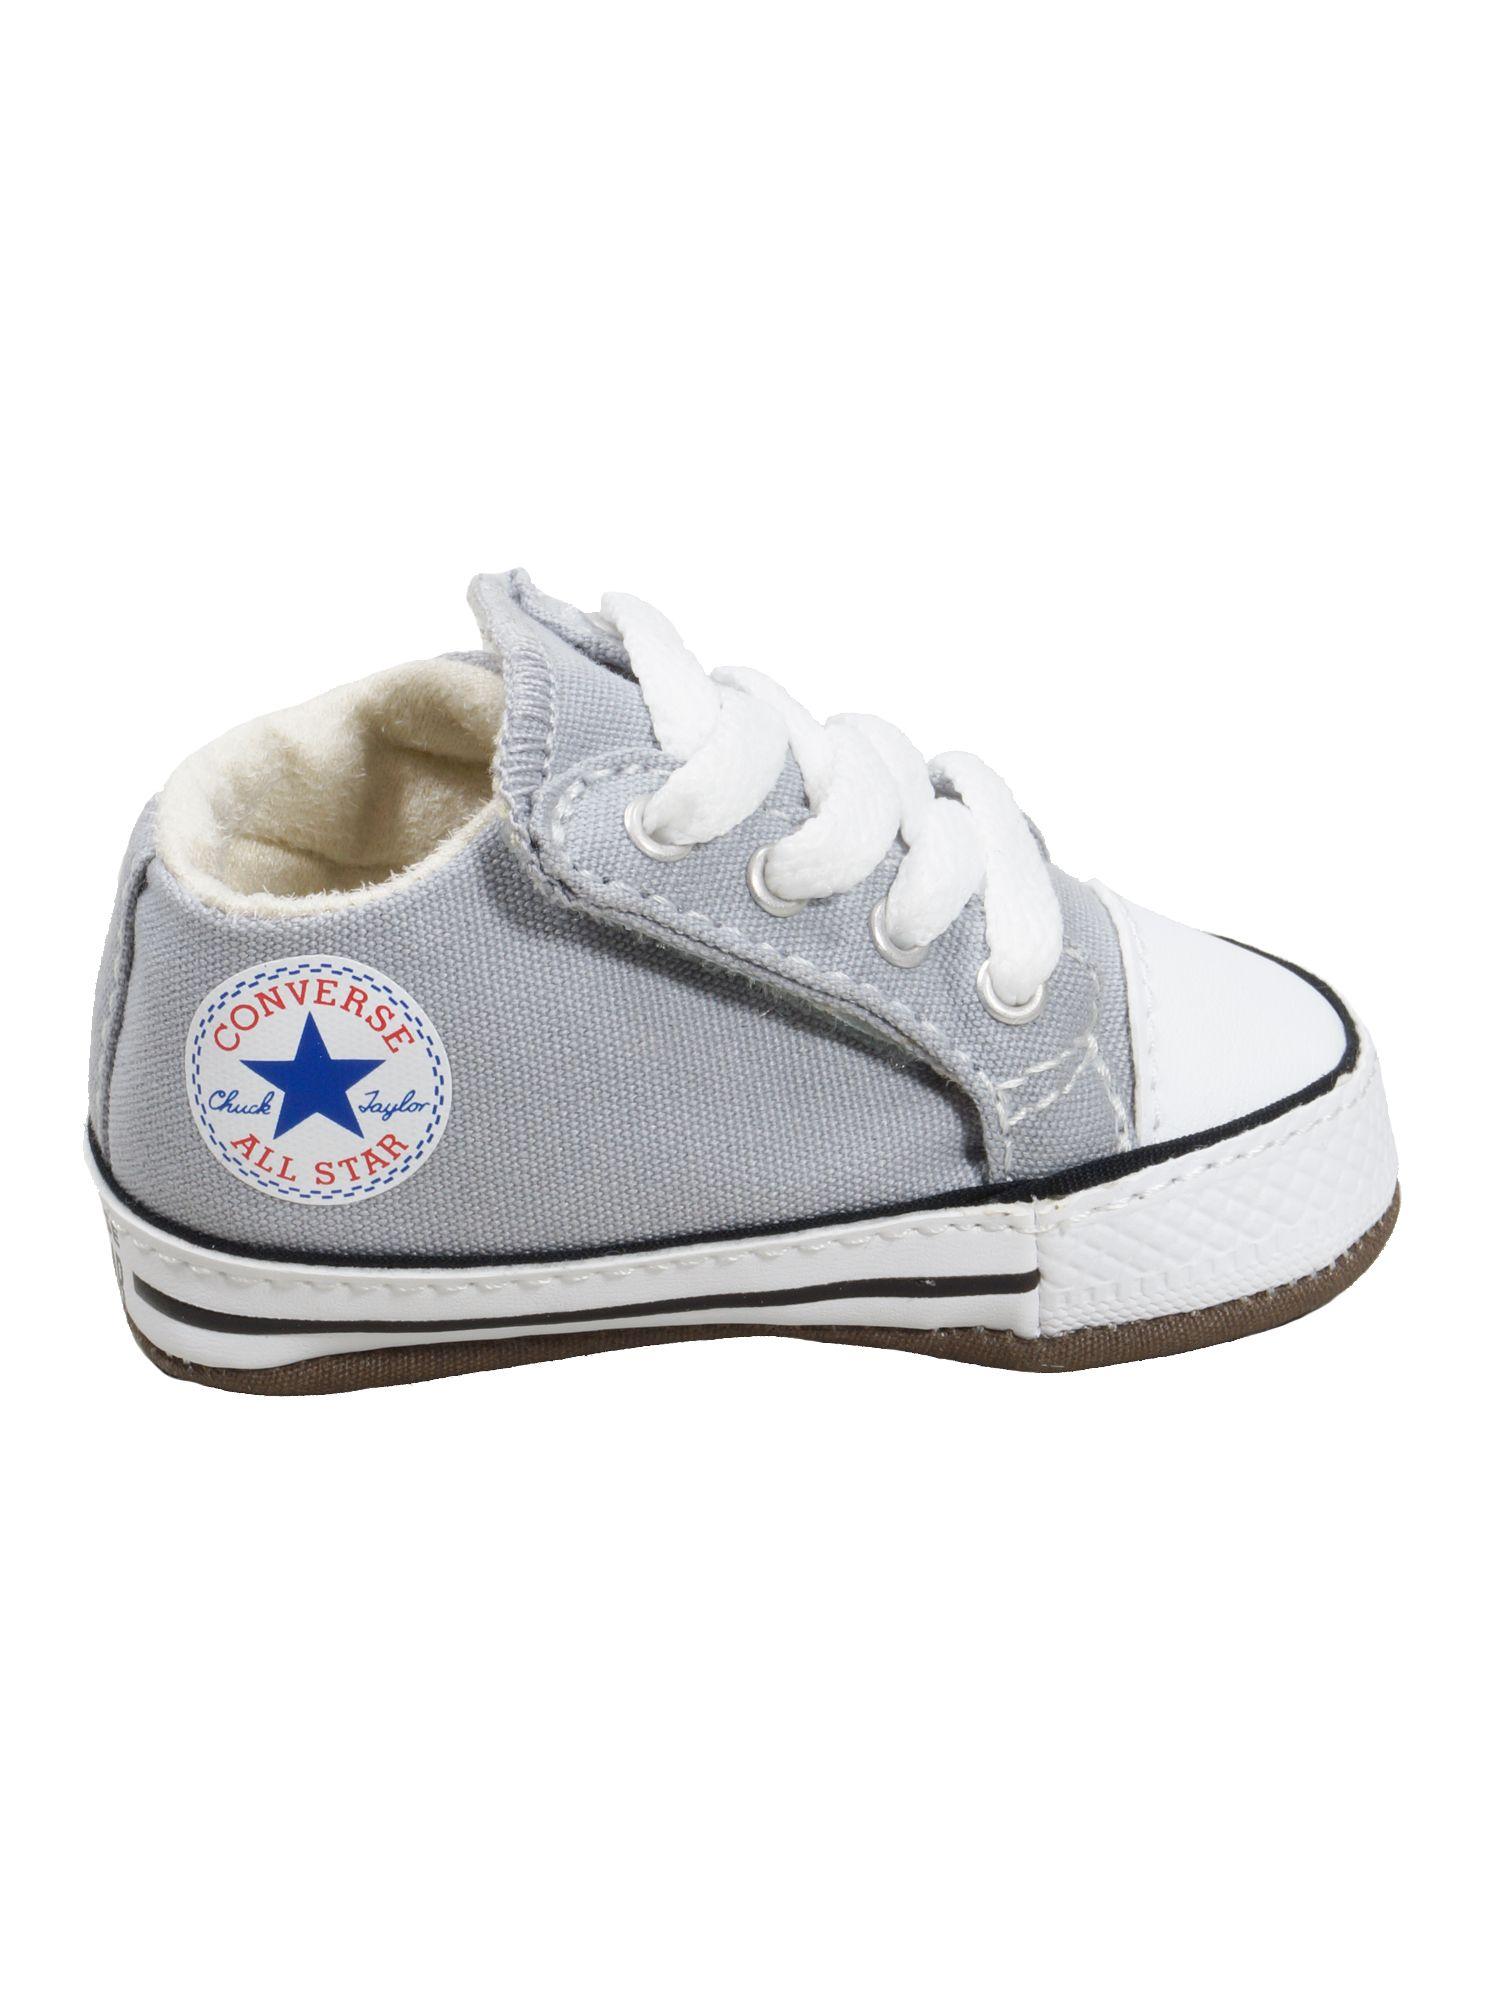 Converse Baby Kinder Schuhe CT All Star Cribster Mid Grau Leinen 18 EU | starlabels outdoor lifestyle leder